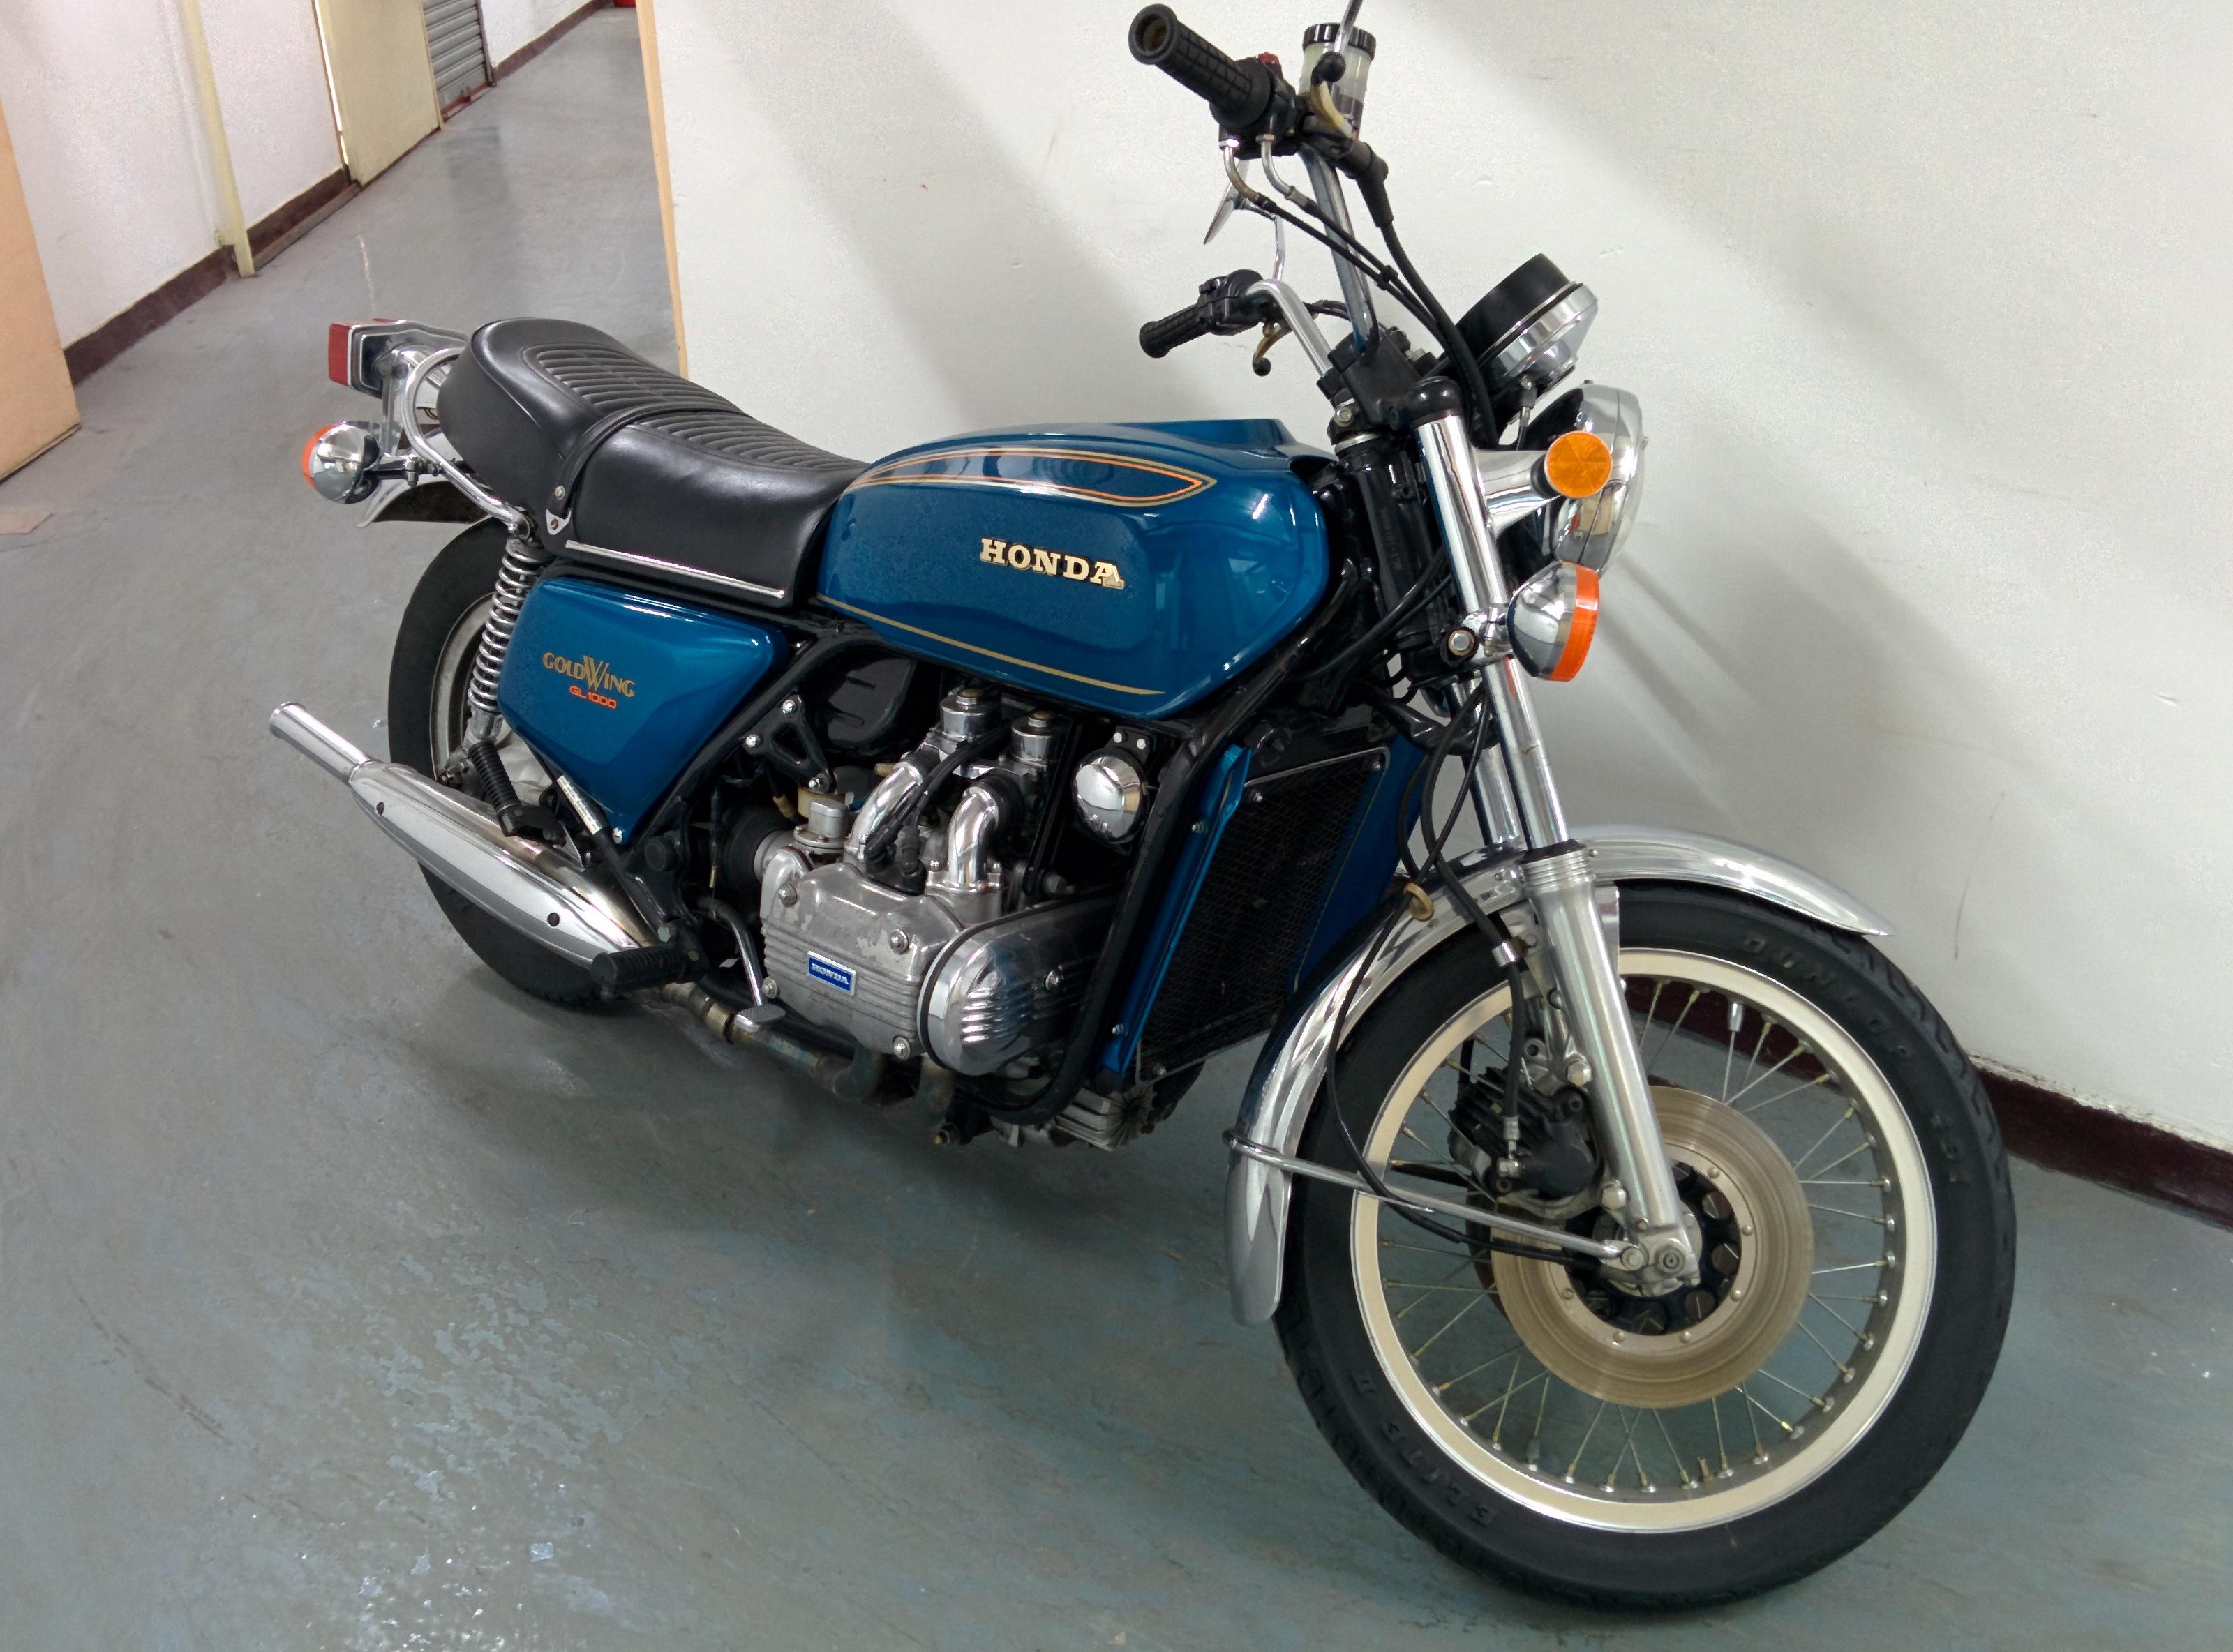 1975 gl1000 goldwing    sold    motion motorcycle 2014 street glide service manual 2013 Harley-Davidson Street Glide